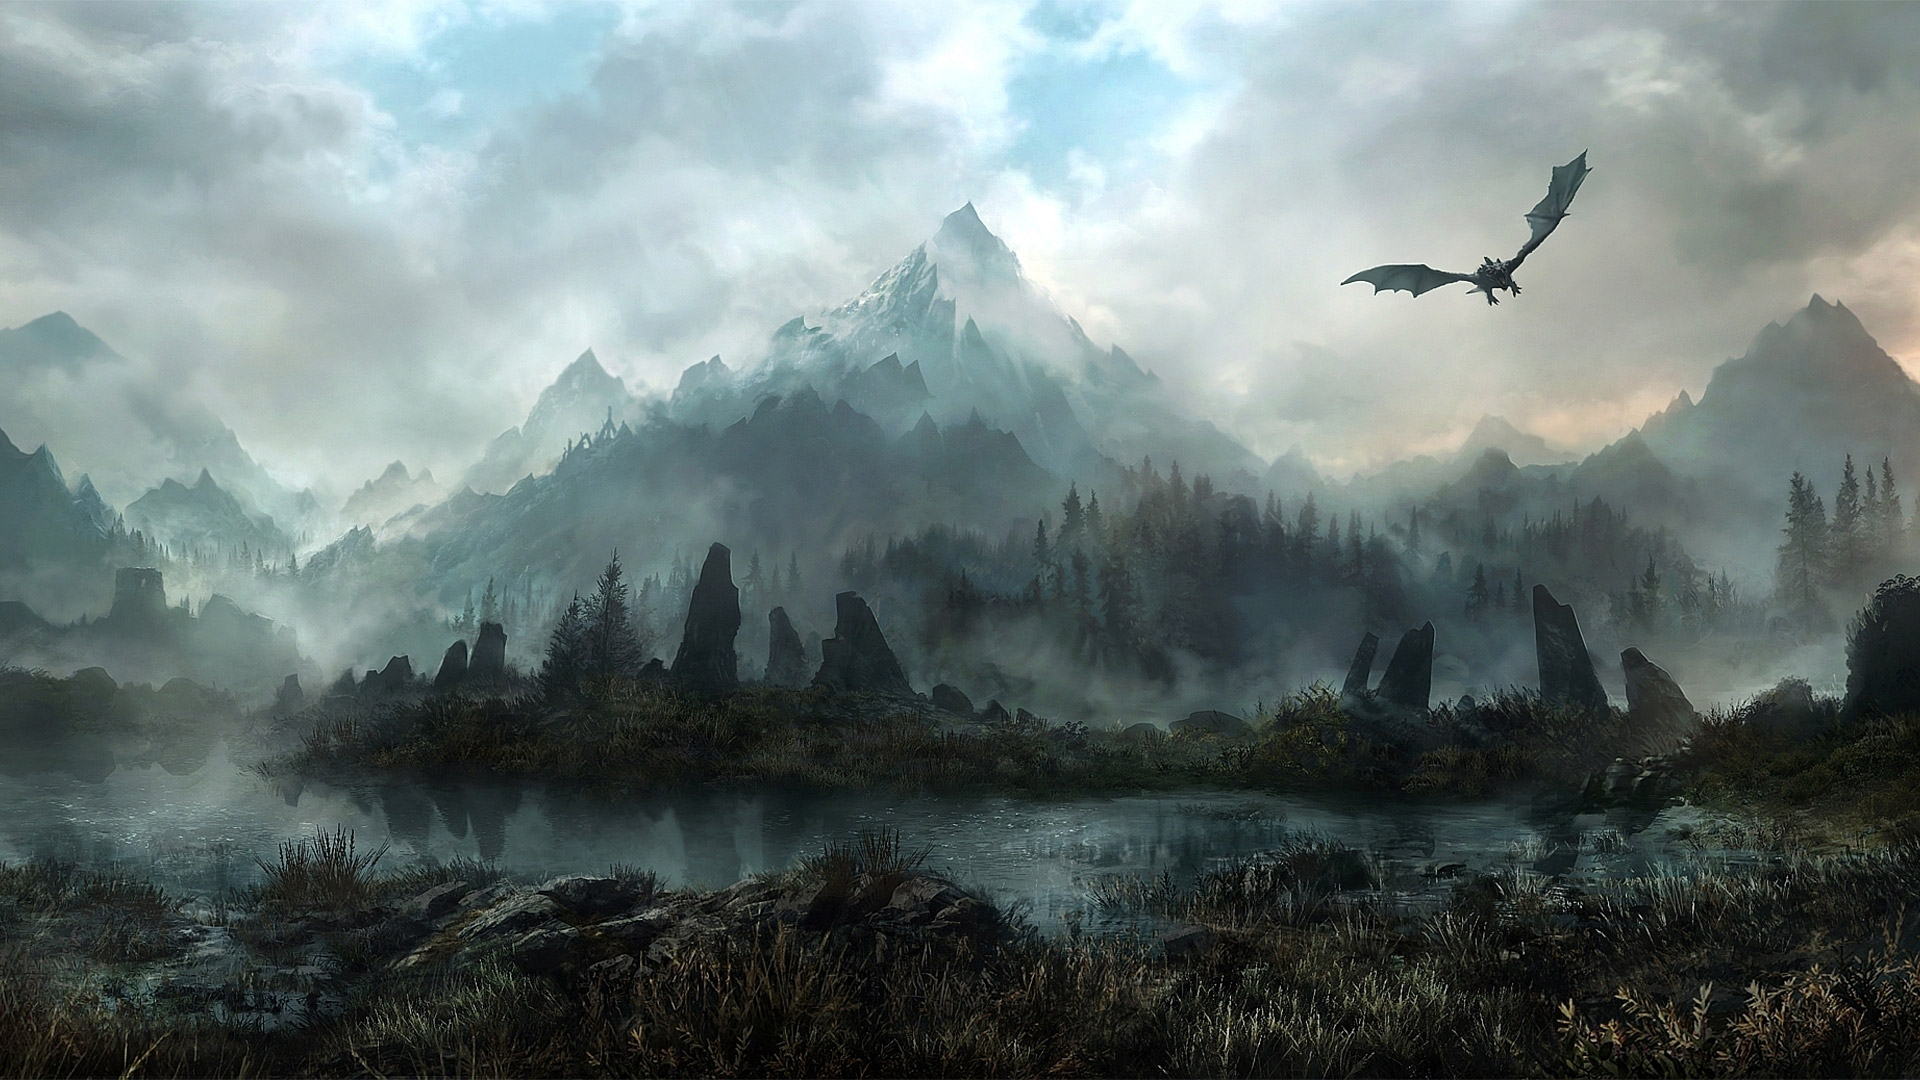 Free The Elder Scrolls V: Skyrim Wallpaper in 1920x1080